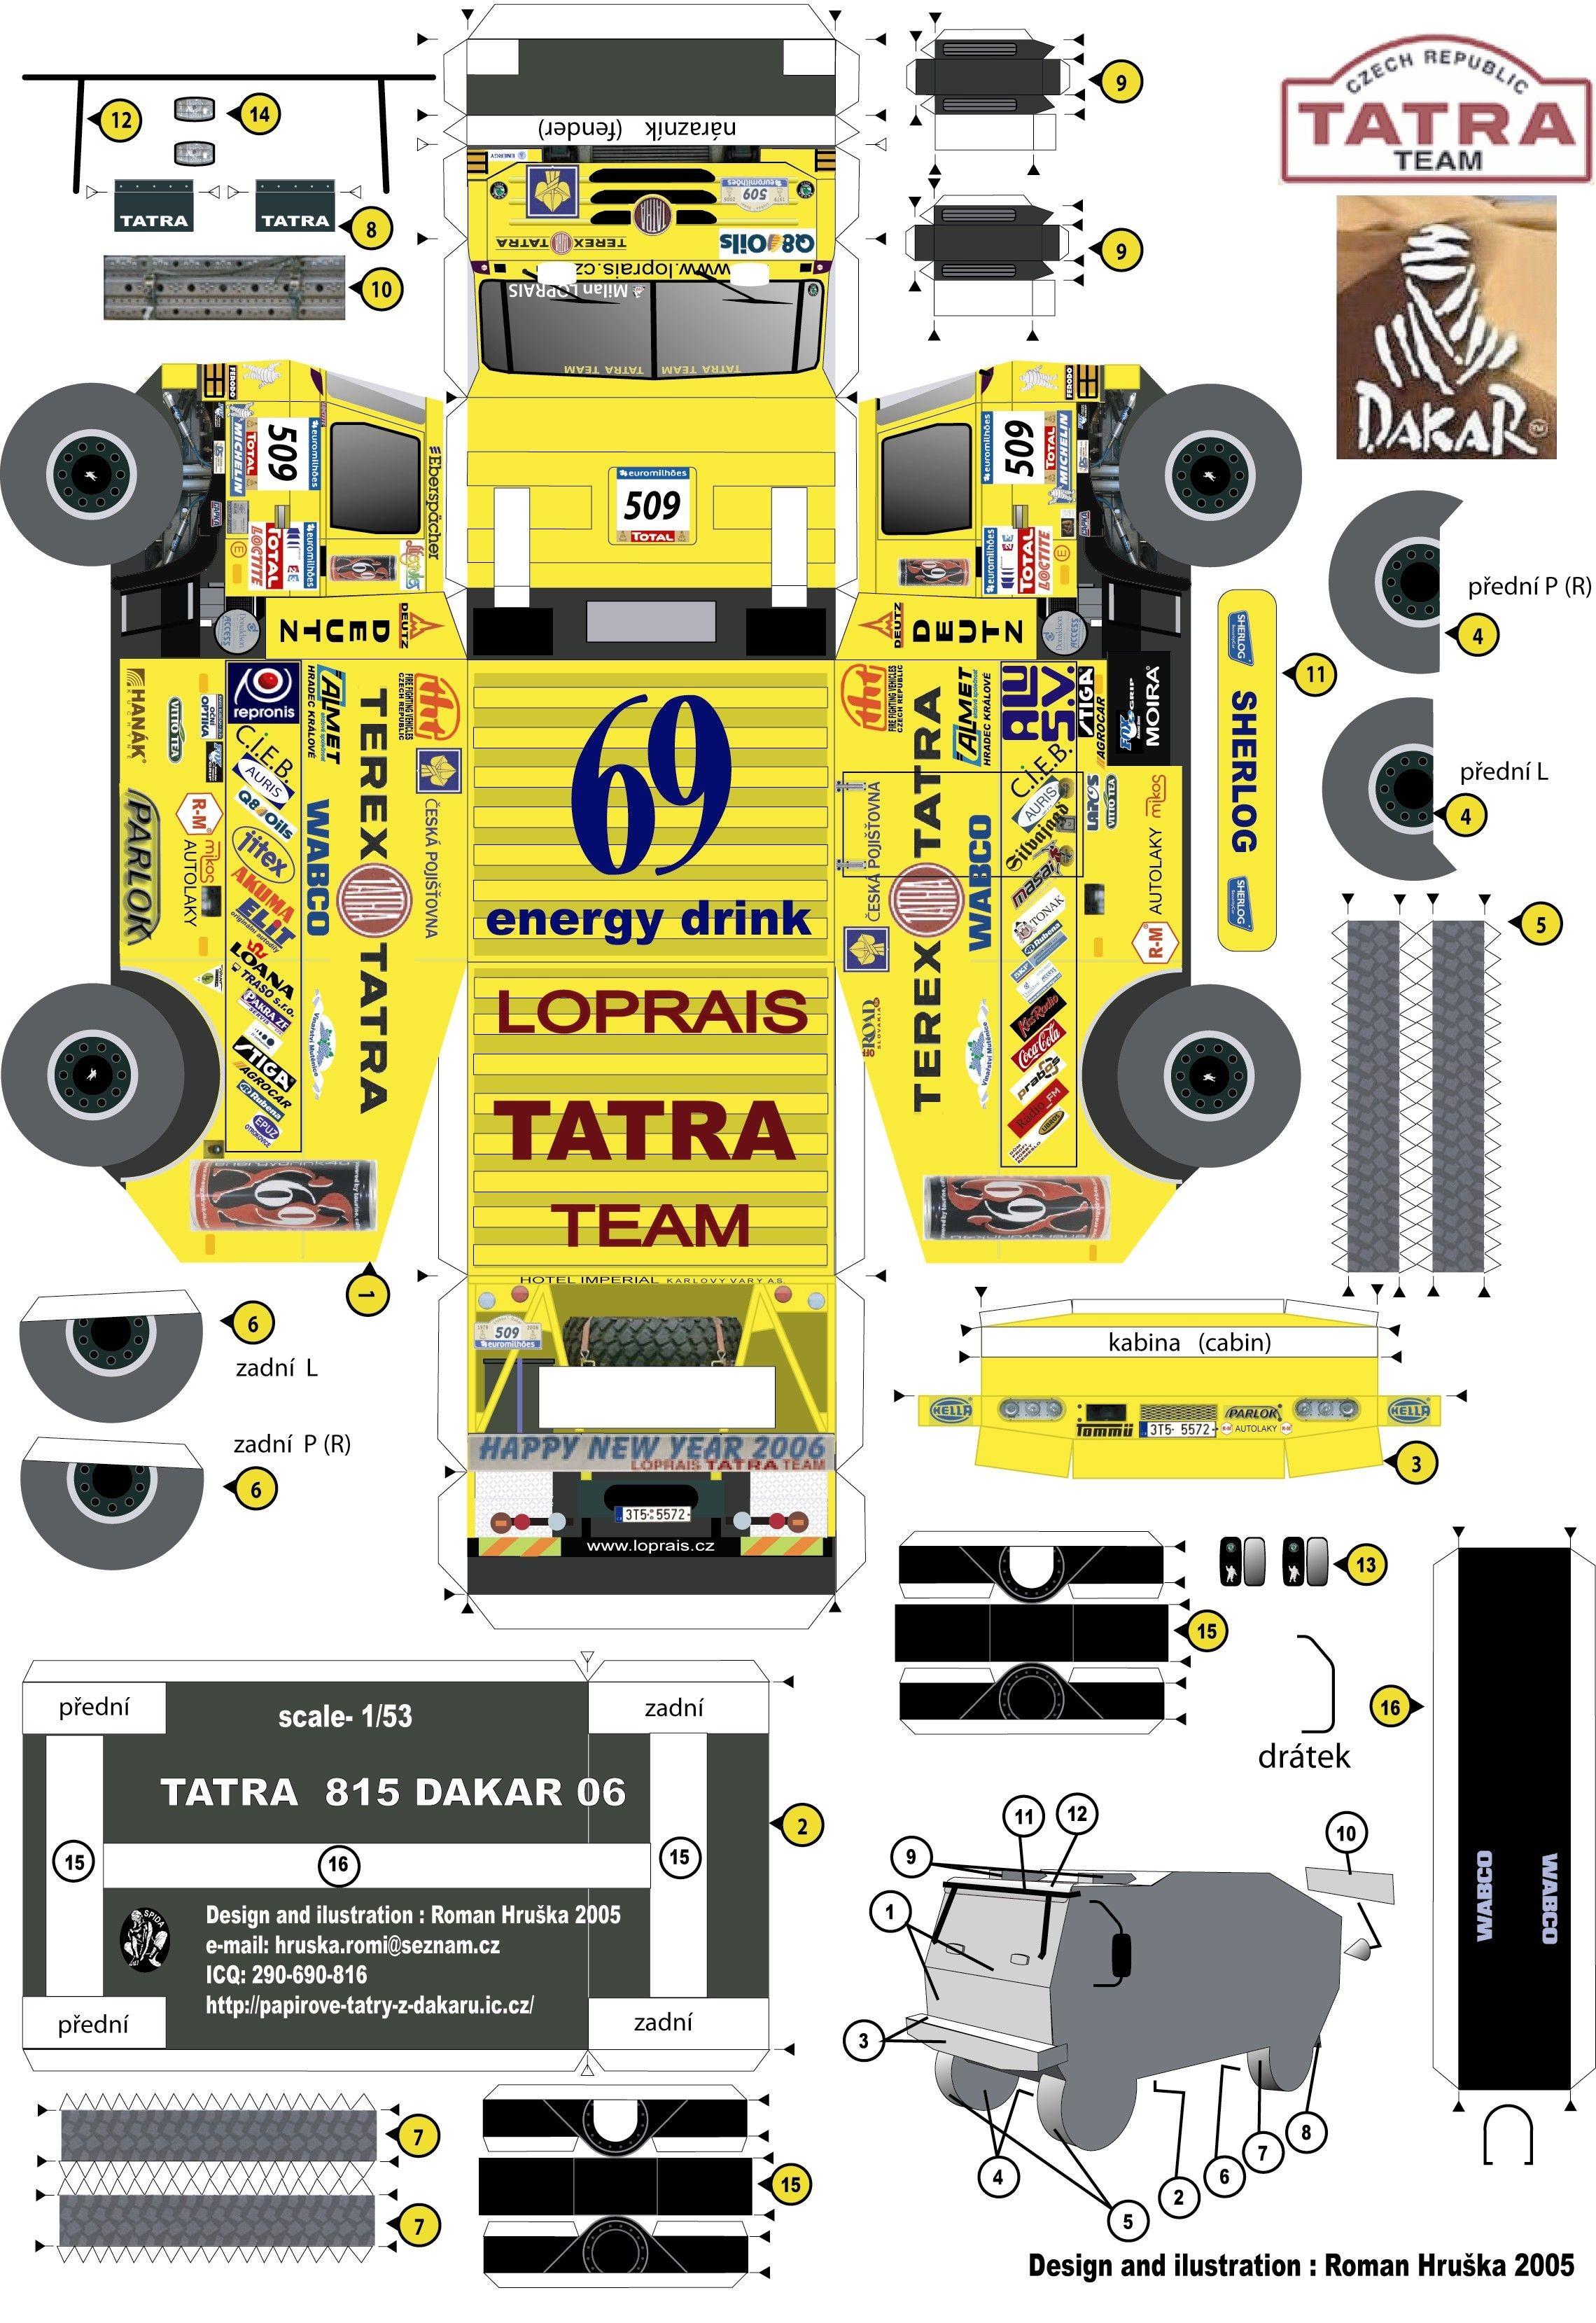 Nissan Papercraft Tatra 2006 Loprais Hobby Papercraft Pinterest